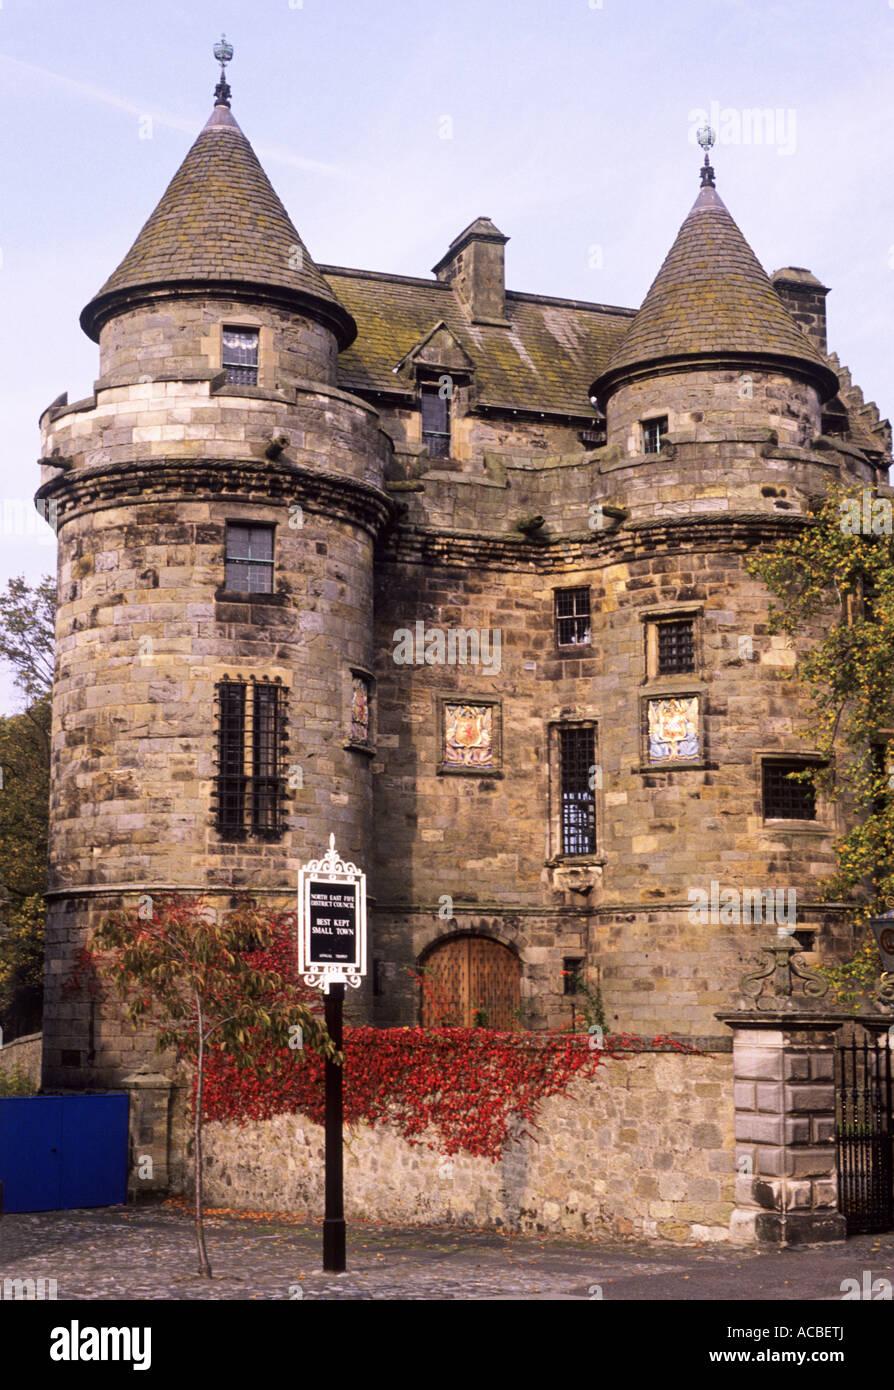 Falkland Palace, Fife, Scotland, UK, 15th and 16th century building,  architecture, history, heritage, Scottish, travel, tourism